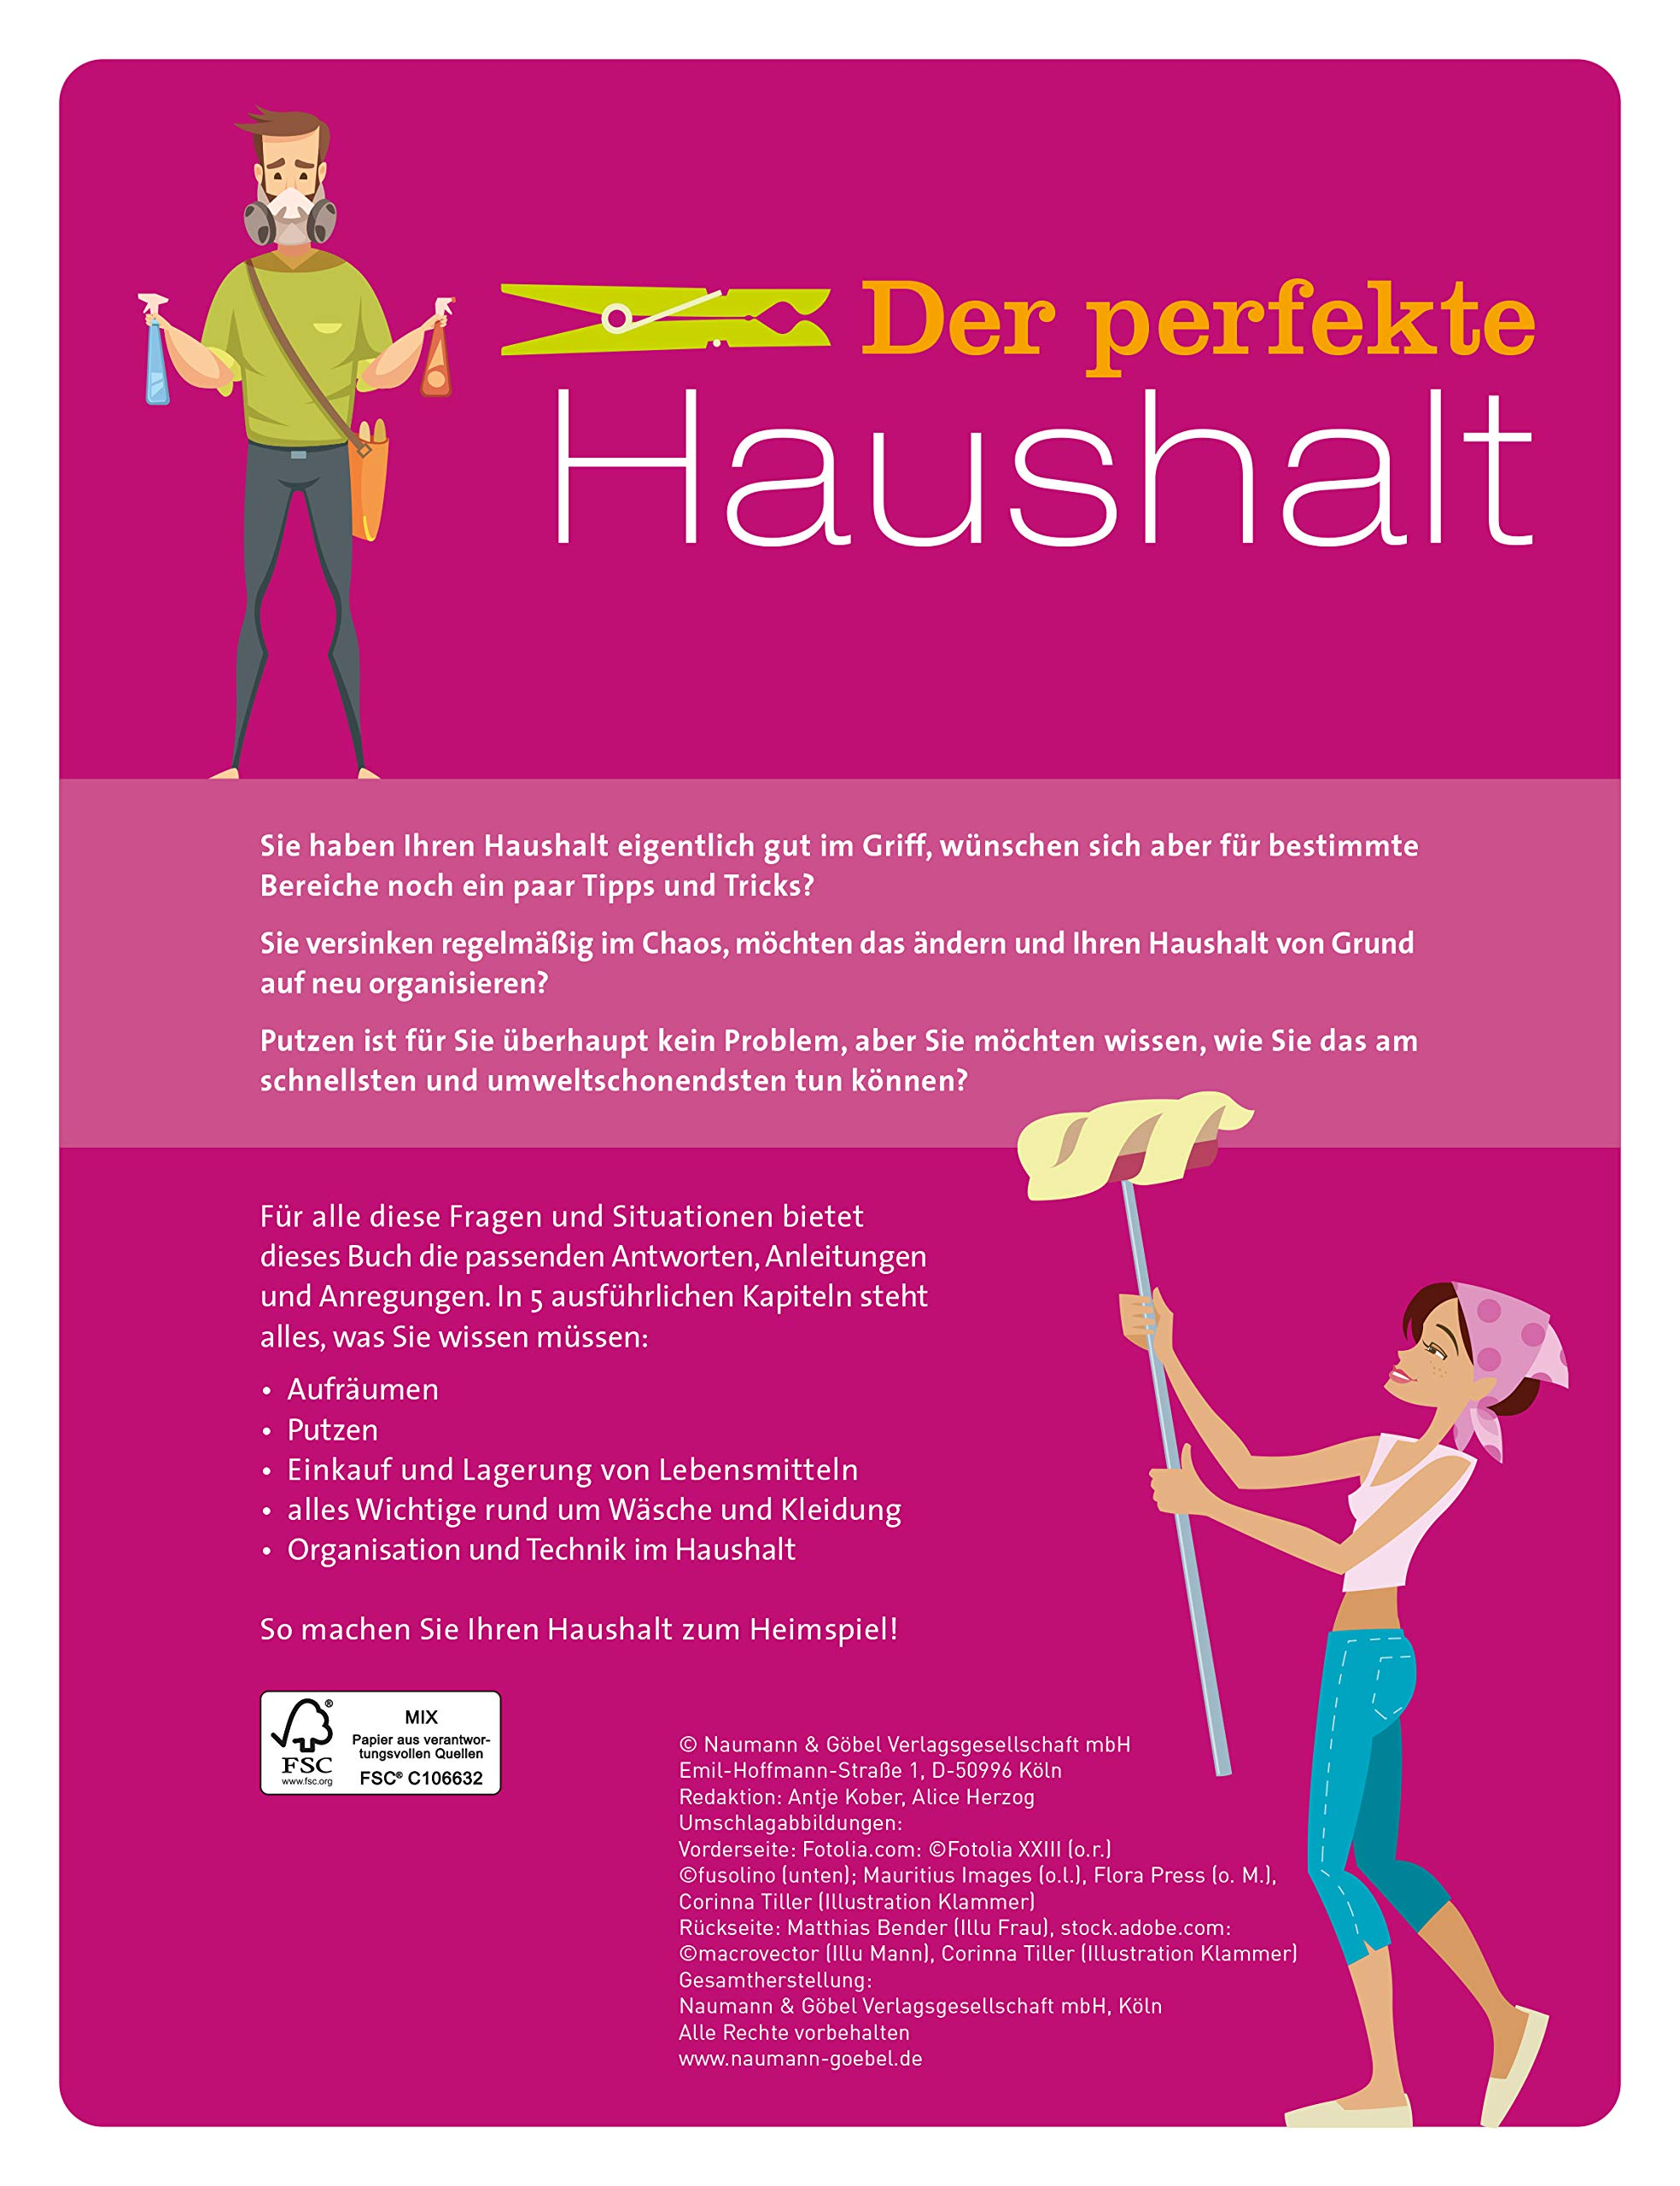 Frau illu redaktion der OLG Naumburg: